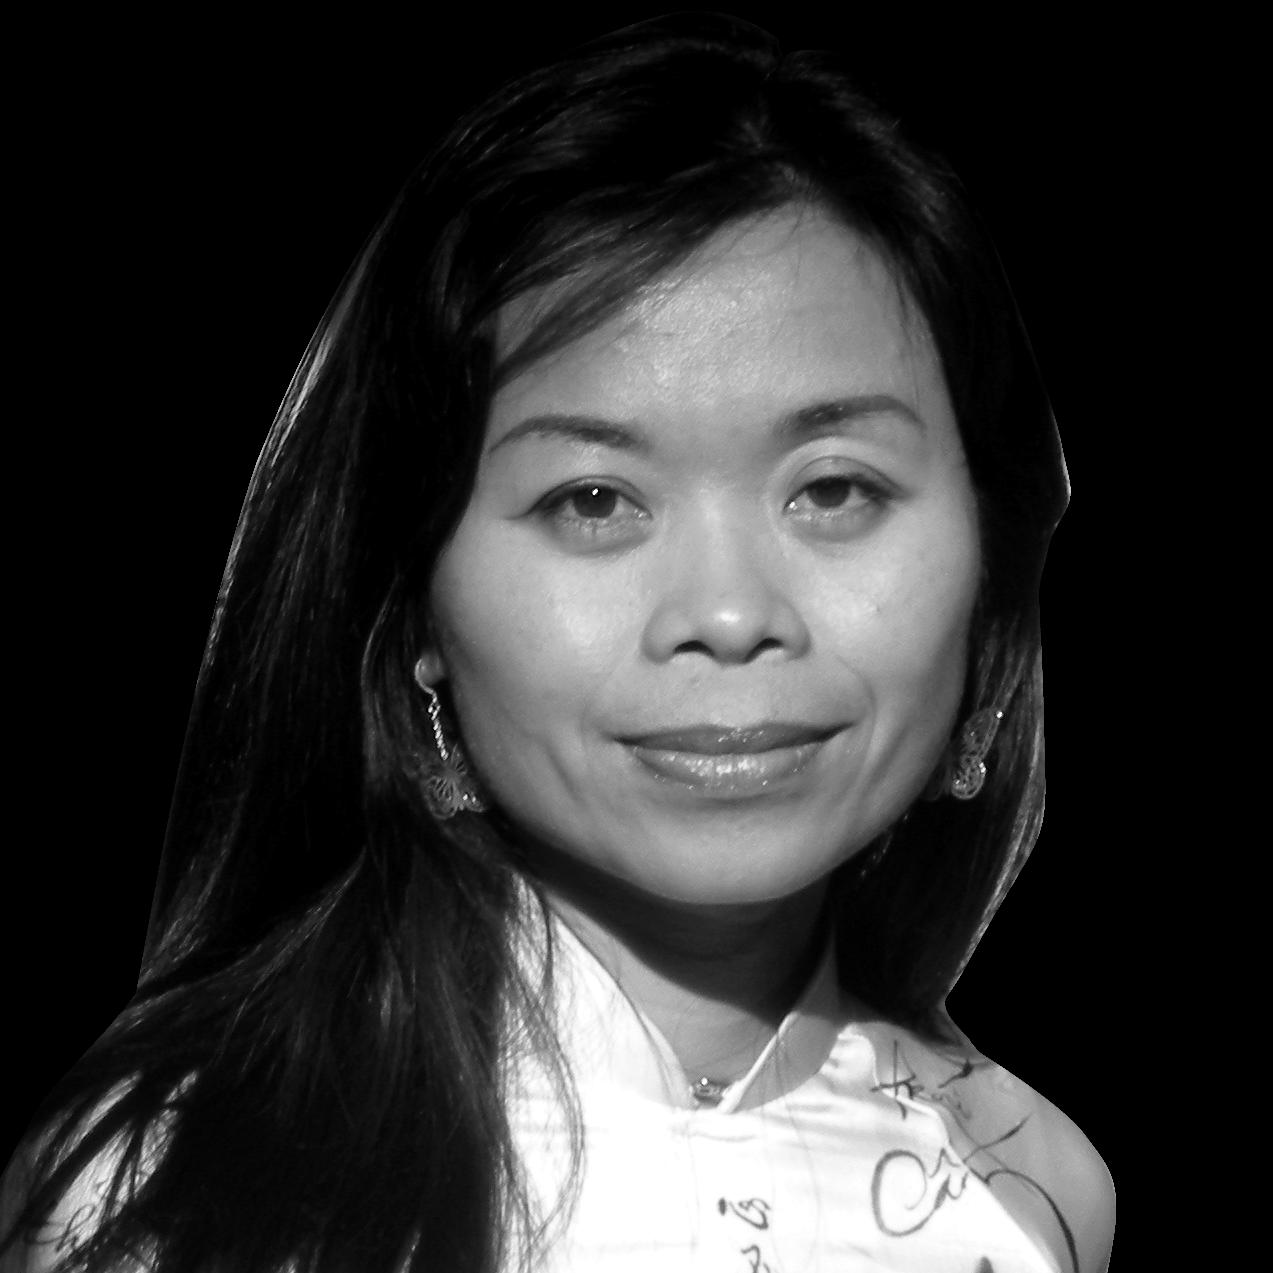 Nguyễn Phan Quế Mai